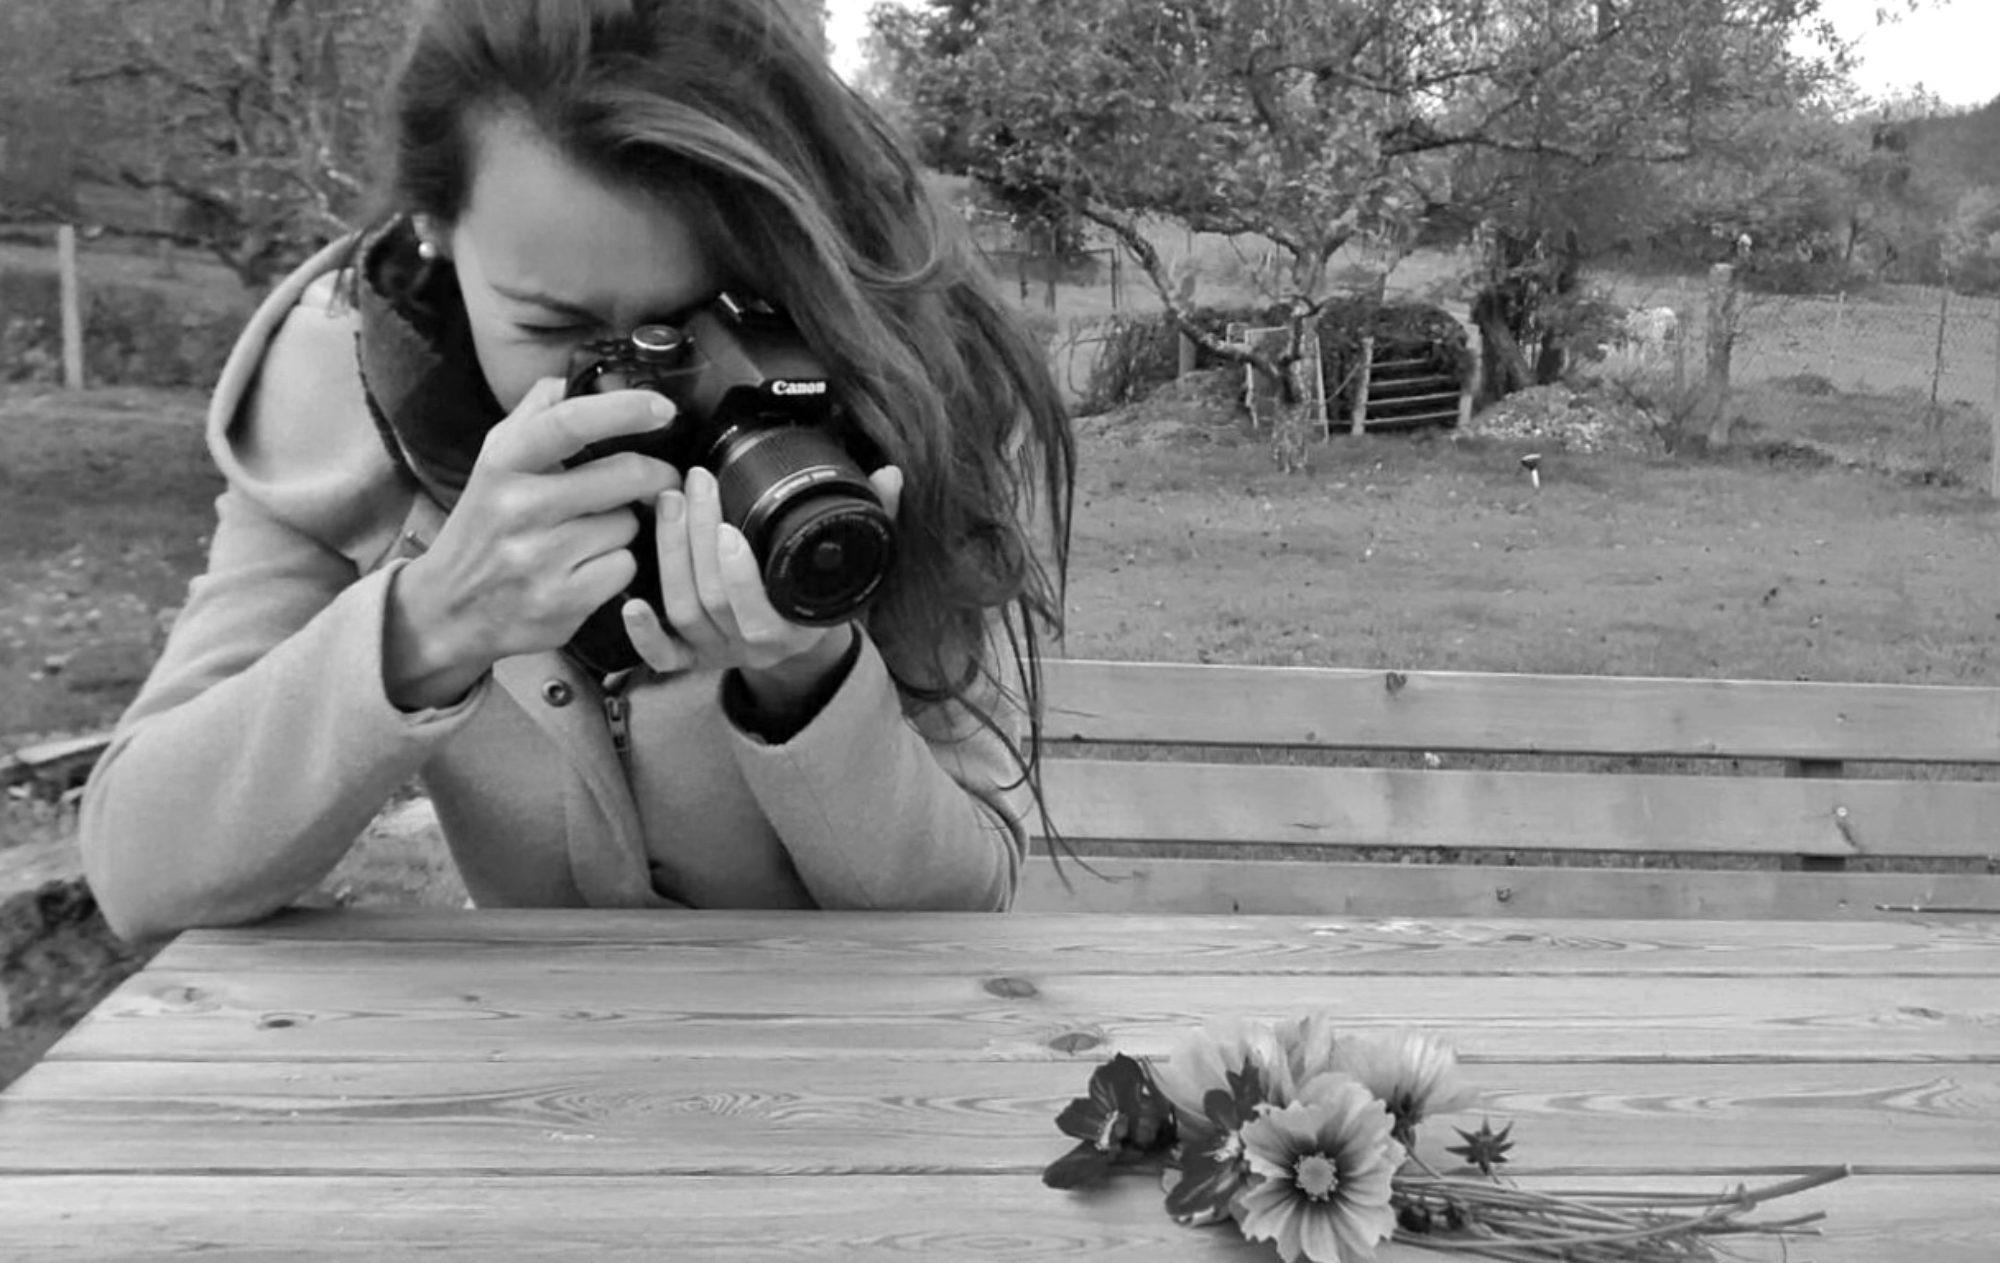 Aleksa's Photo Blog